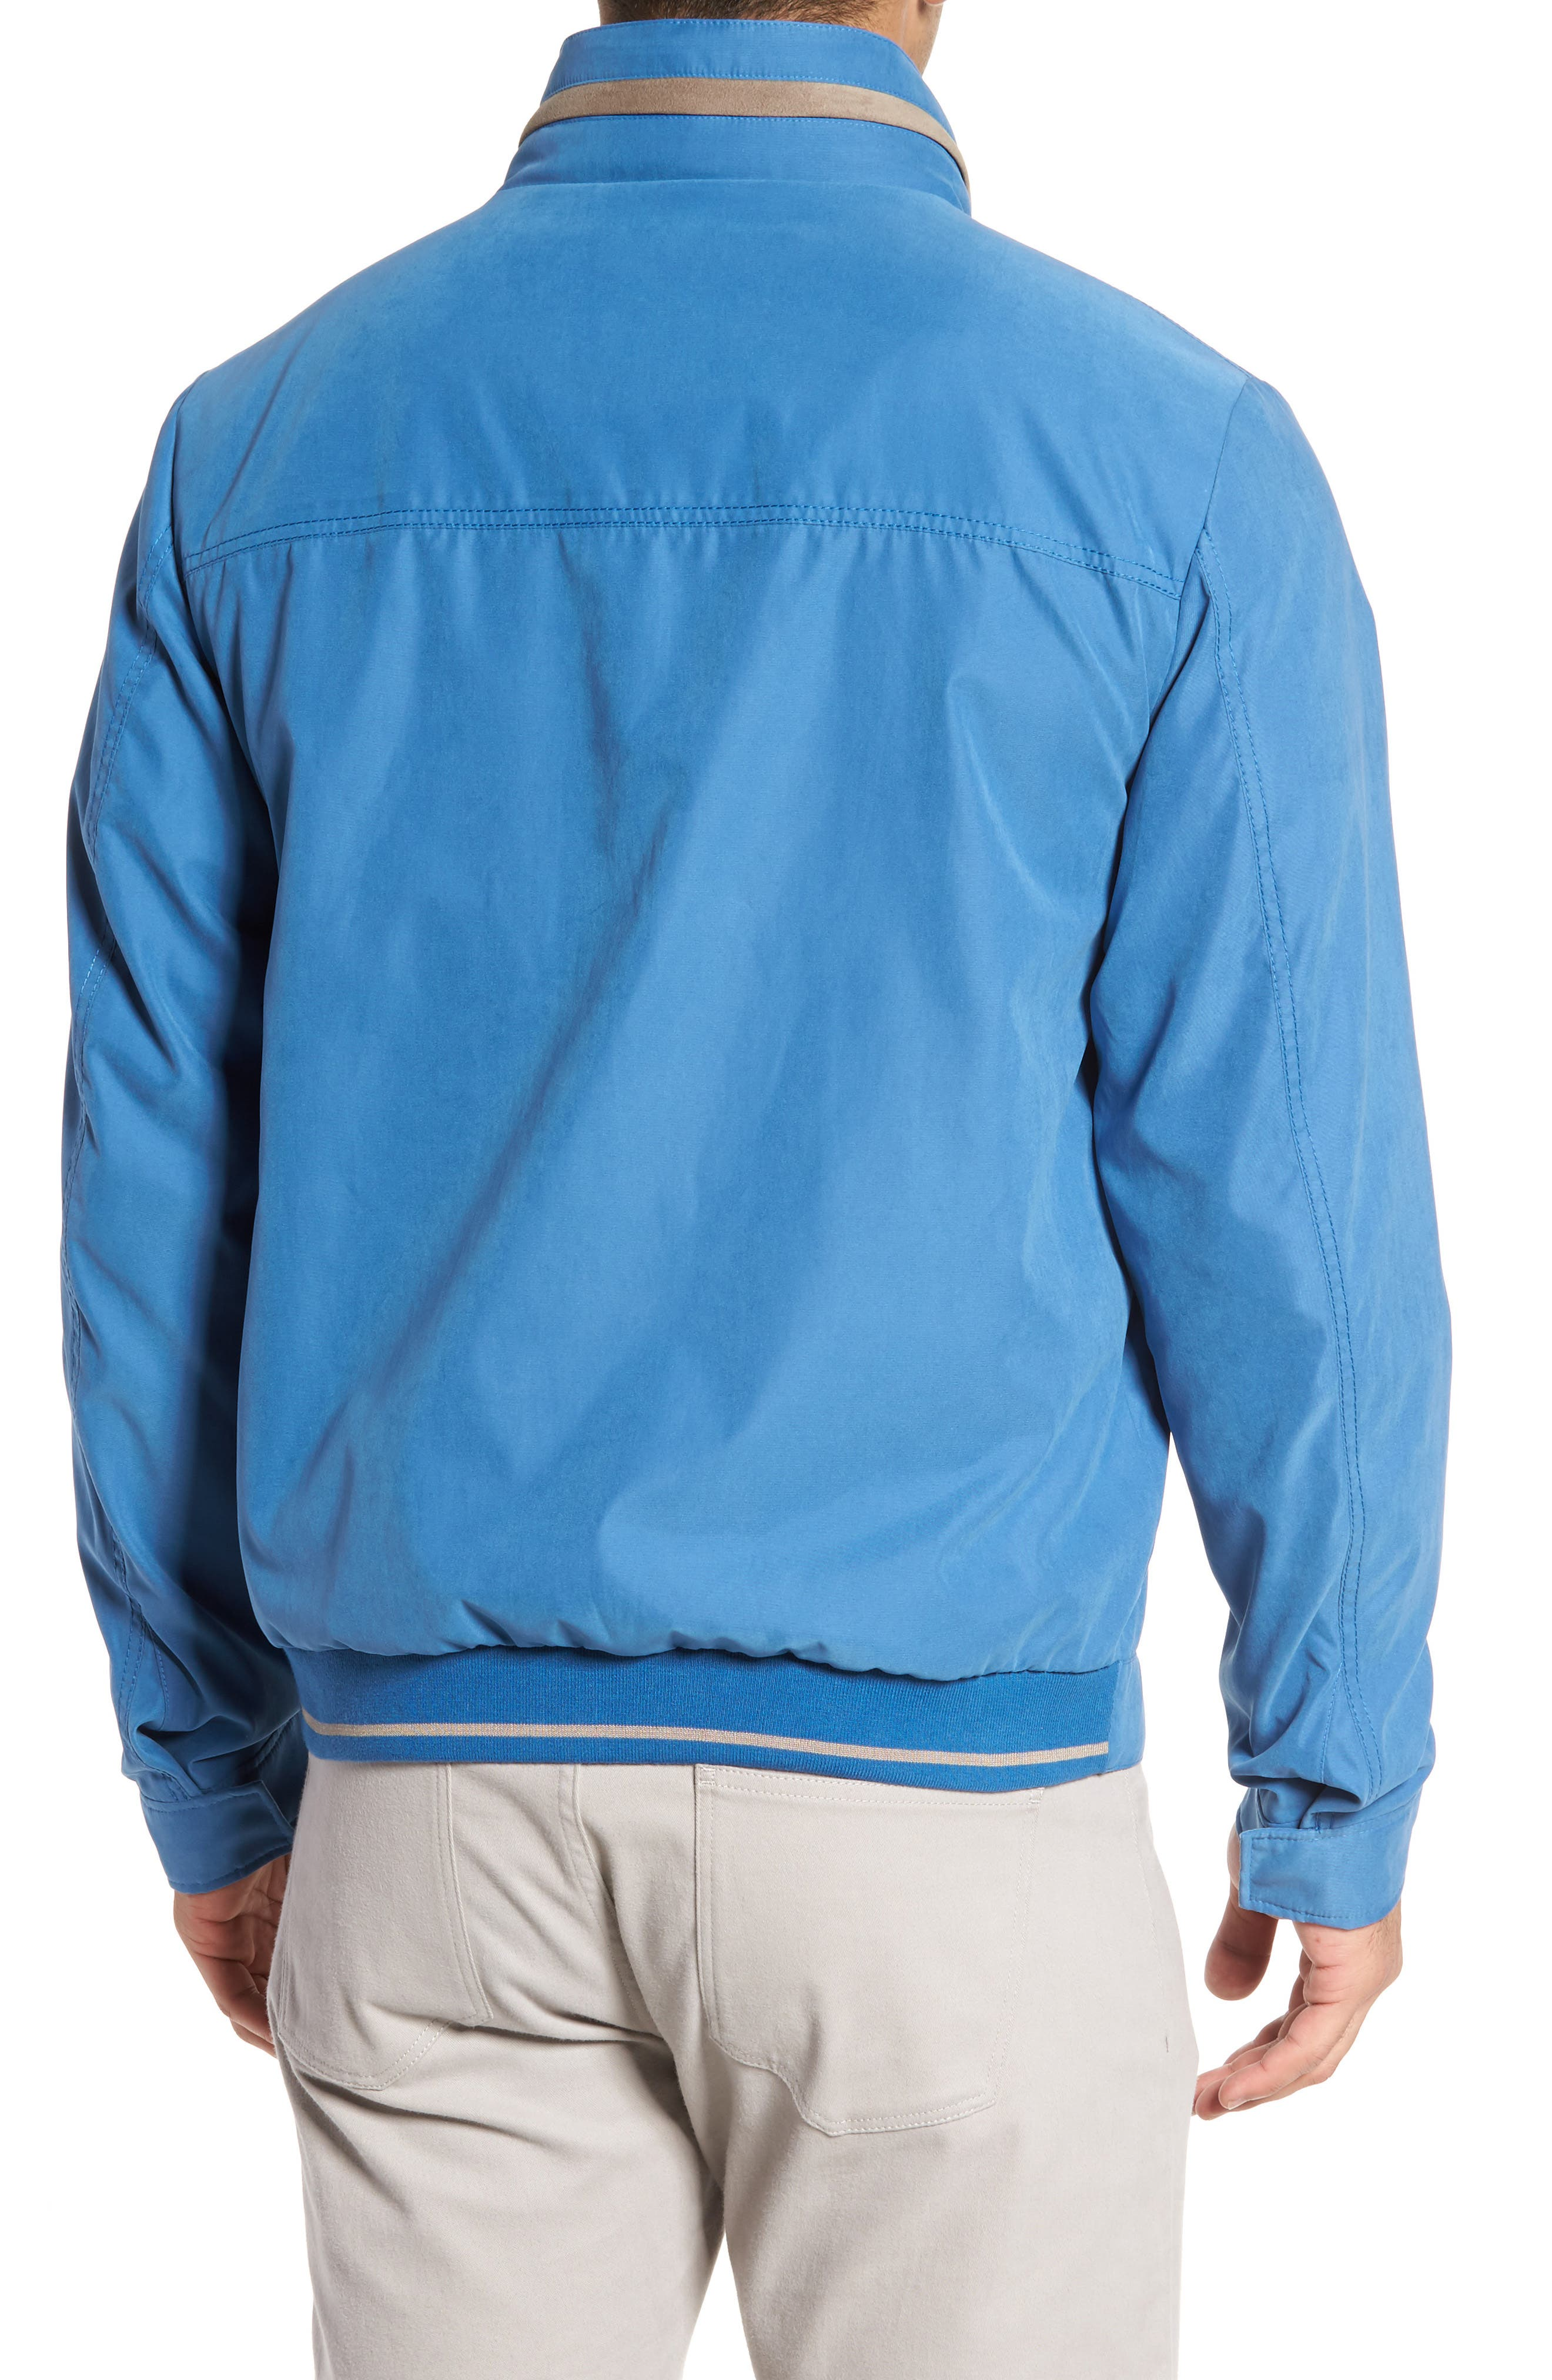 Paul&Shark Water Repellent Microfiber Jacket,                             Alternate thumbnail 2, color,                             Blue